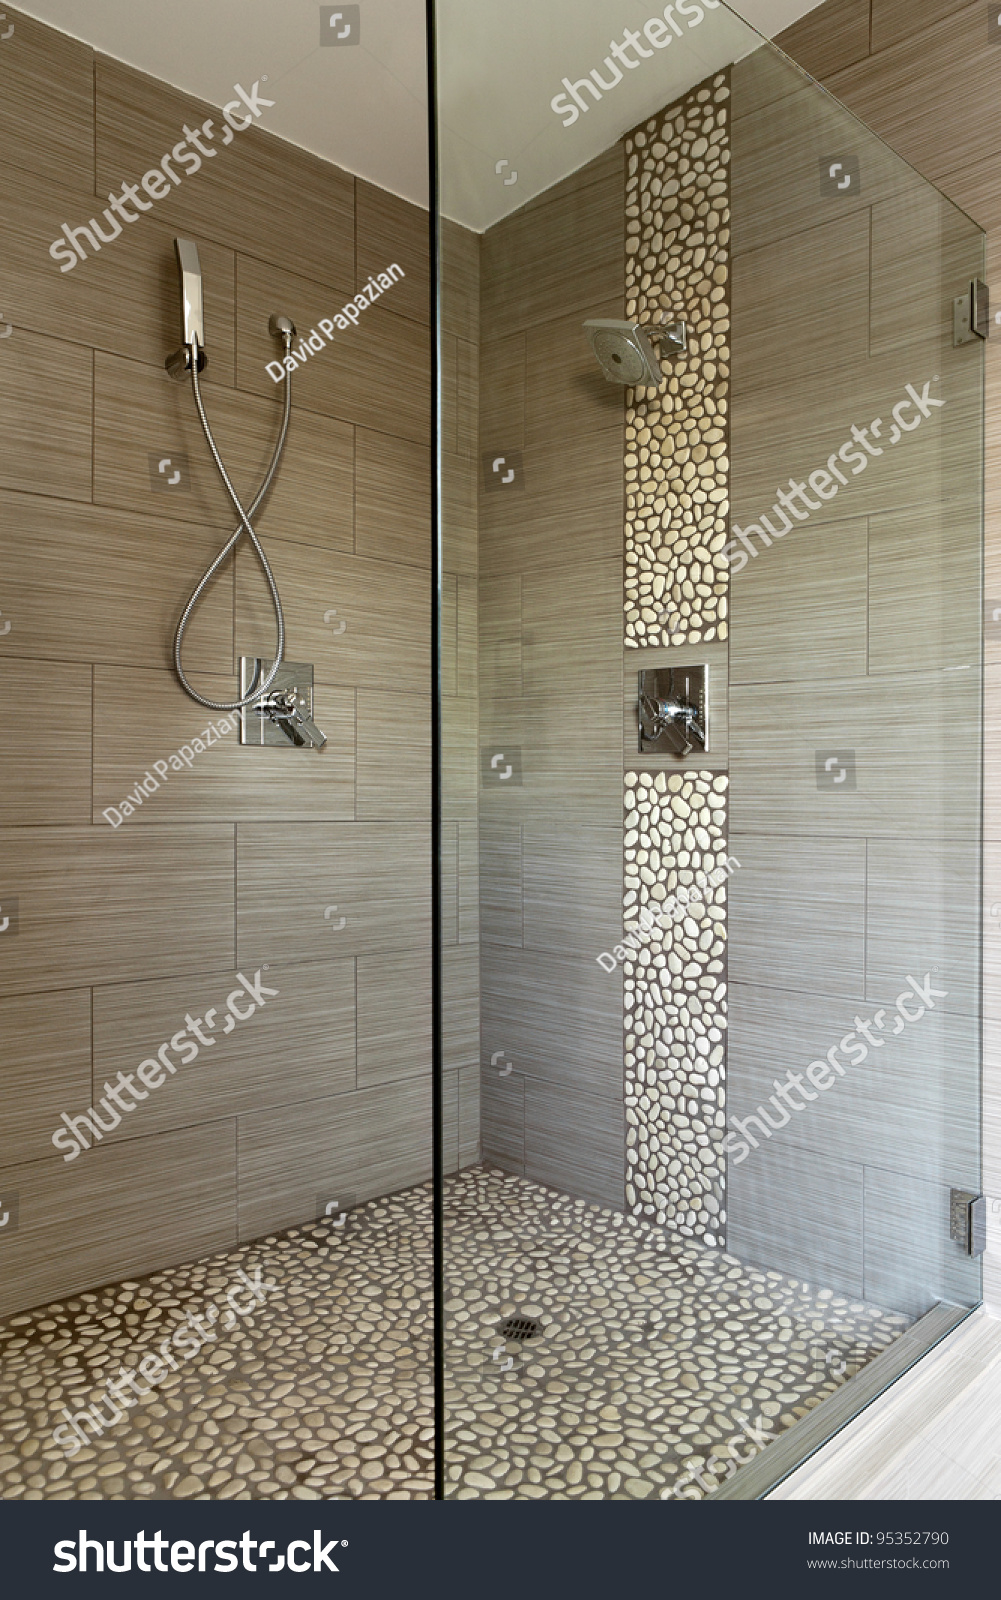 Contemporary bathroom shower dual shower heads stock photo 95352790 shutterstock - Glass shower head ...